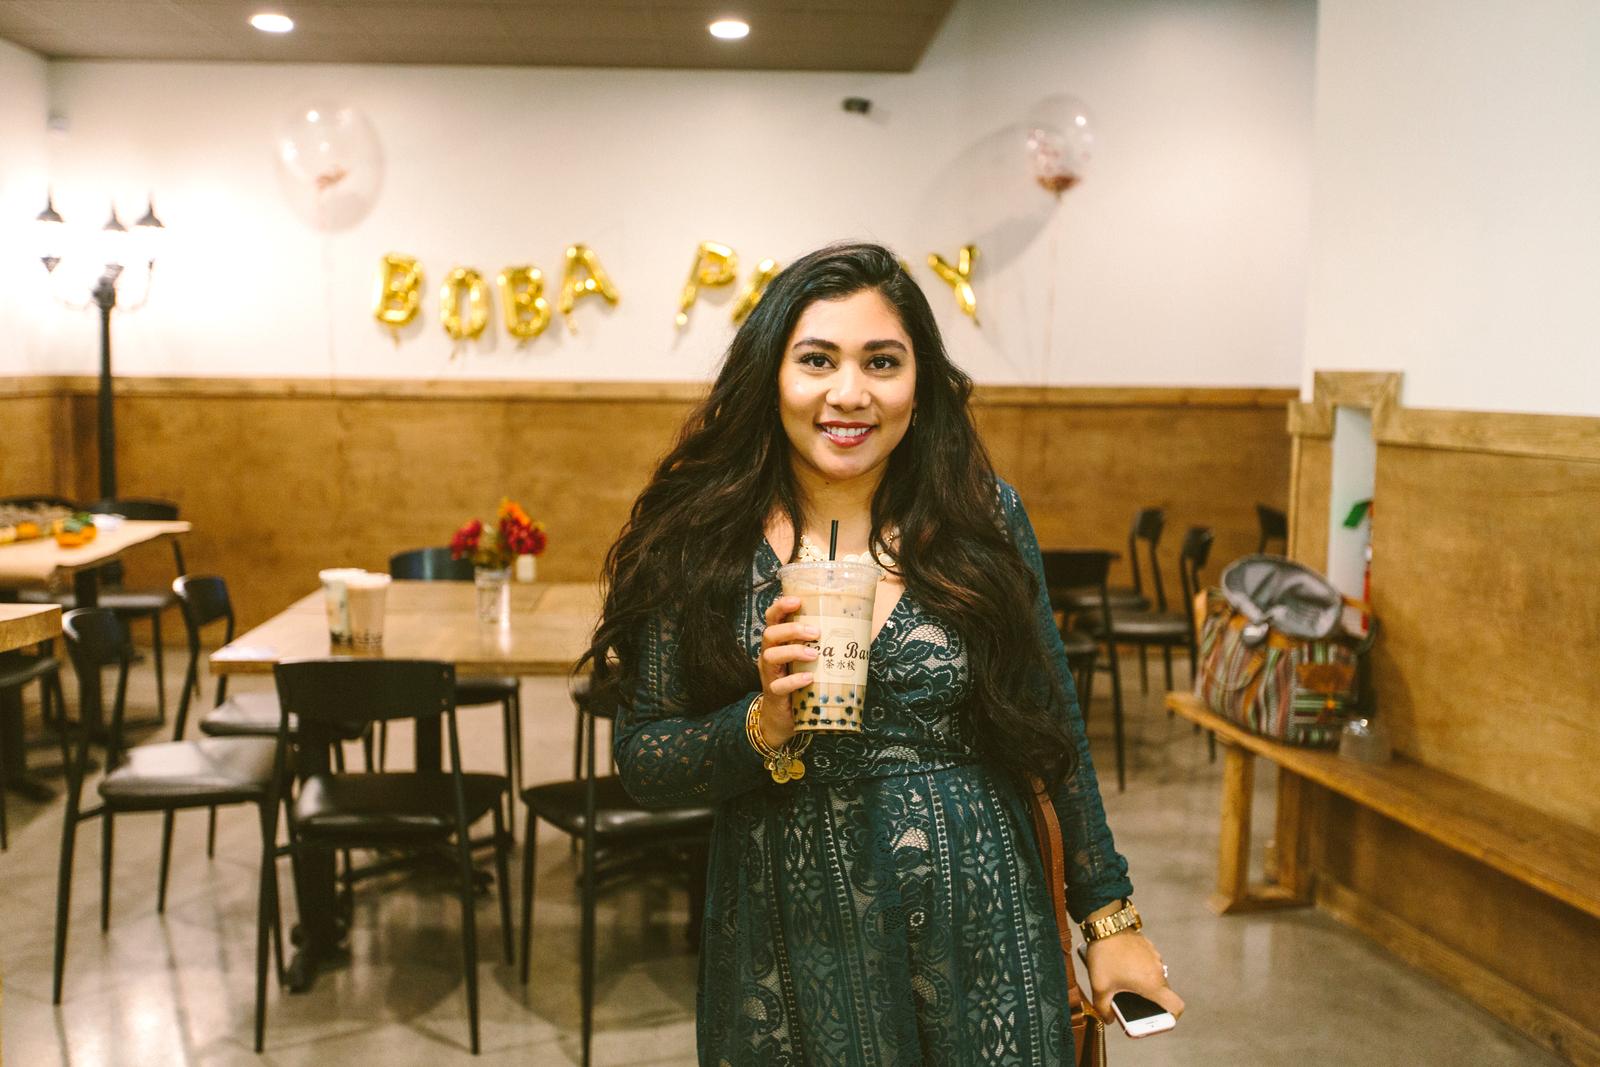 Bubble Tea in Salt Lake City at Tea Bar